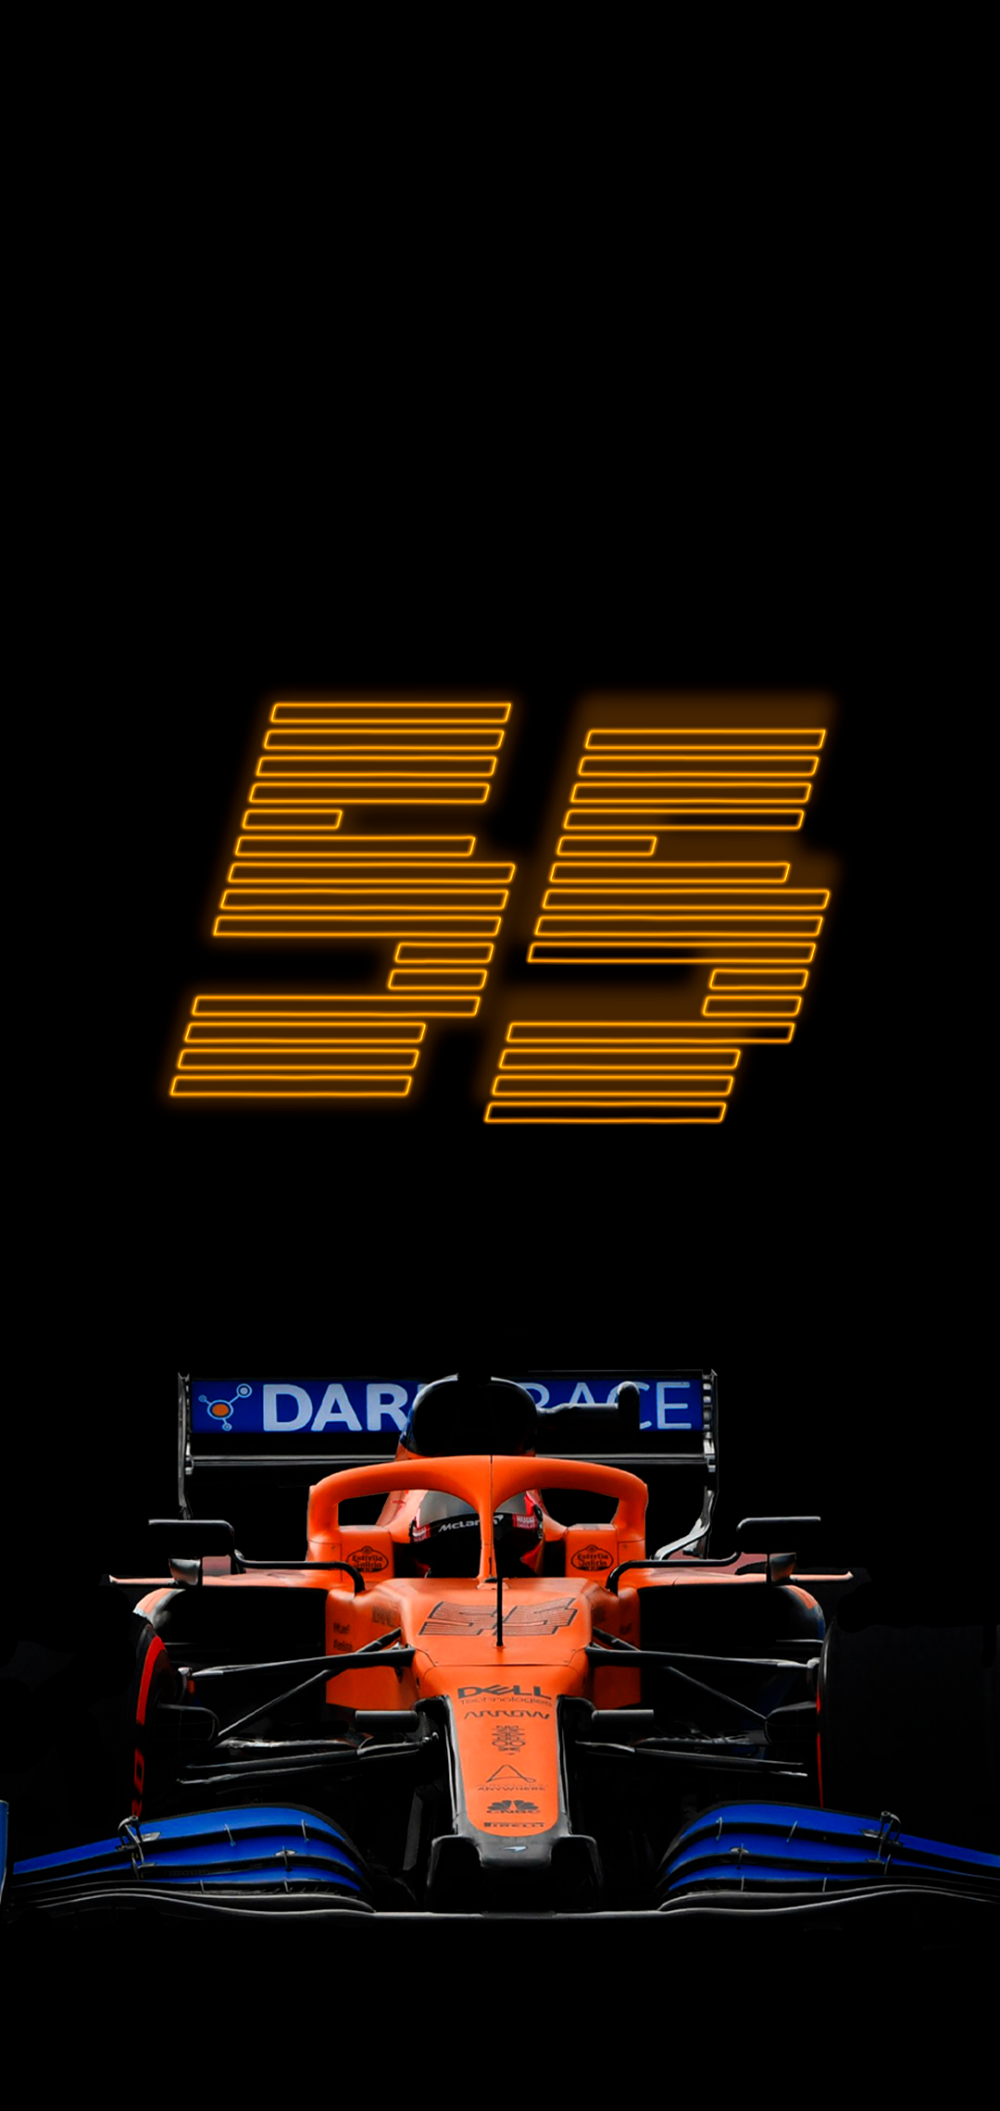 Carlos Sainz Mcl35 F1 2020 1080x2280 9 19 Amoledbackgrounds In 2020 Mclaren F1 Mclaren F1 Poster